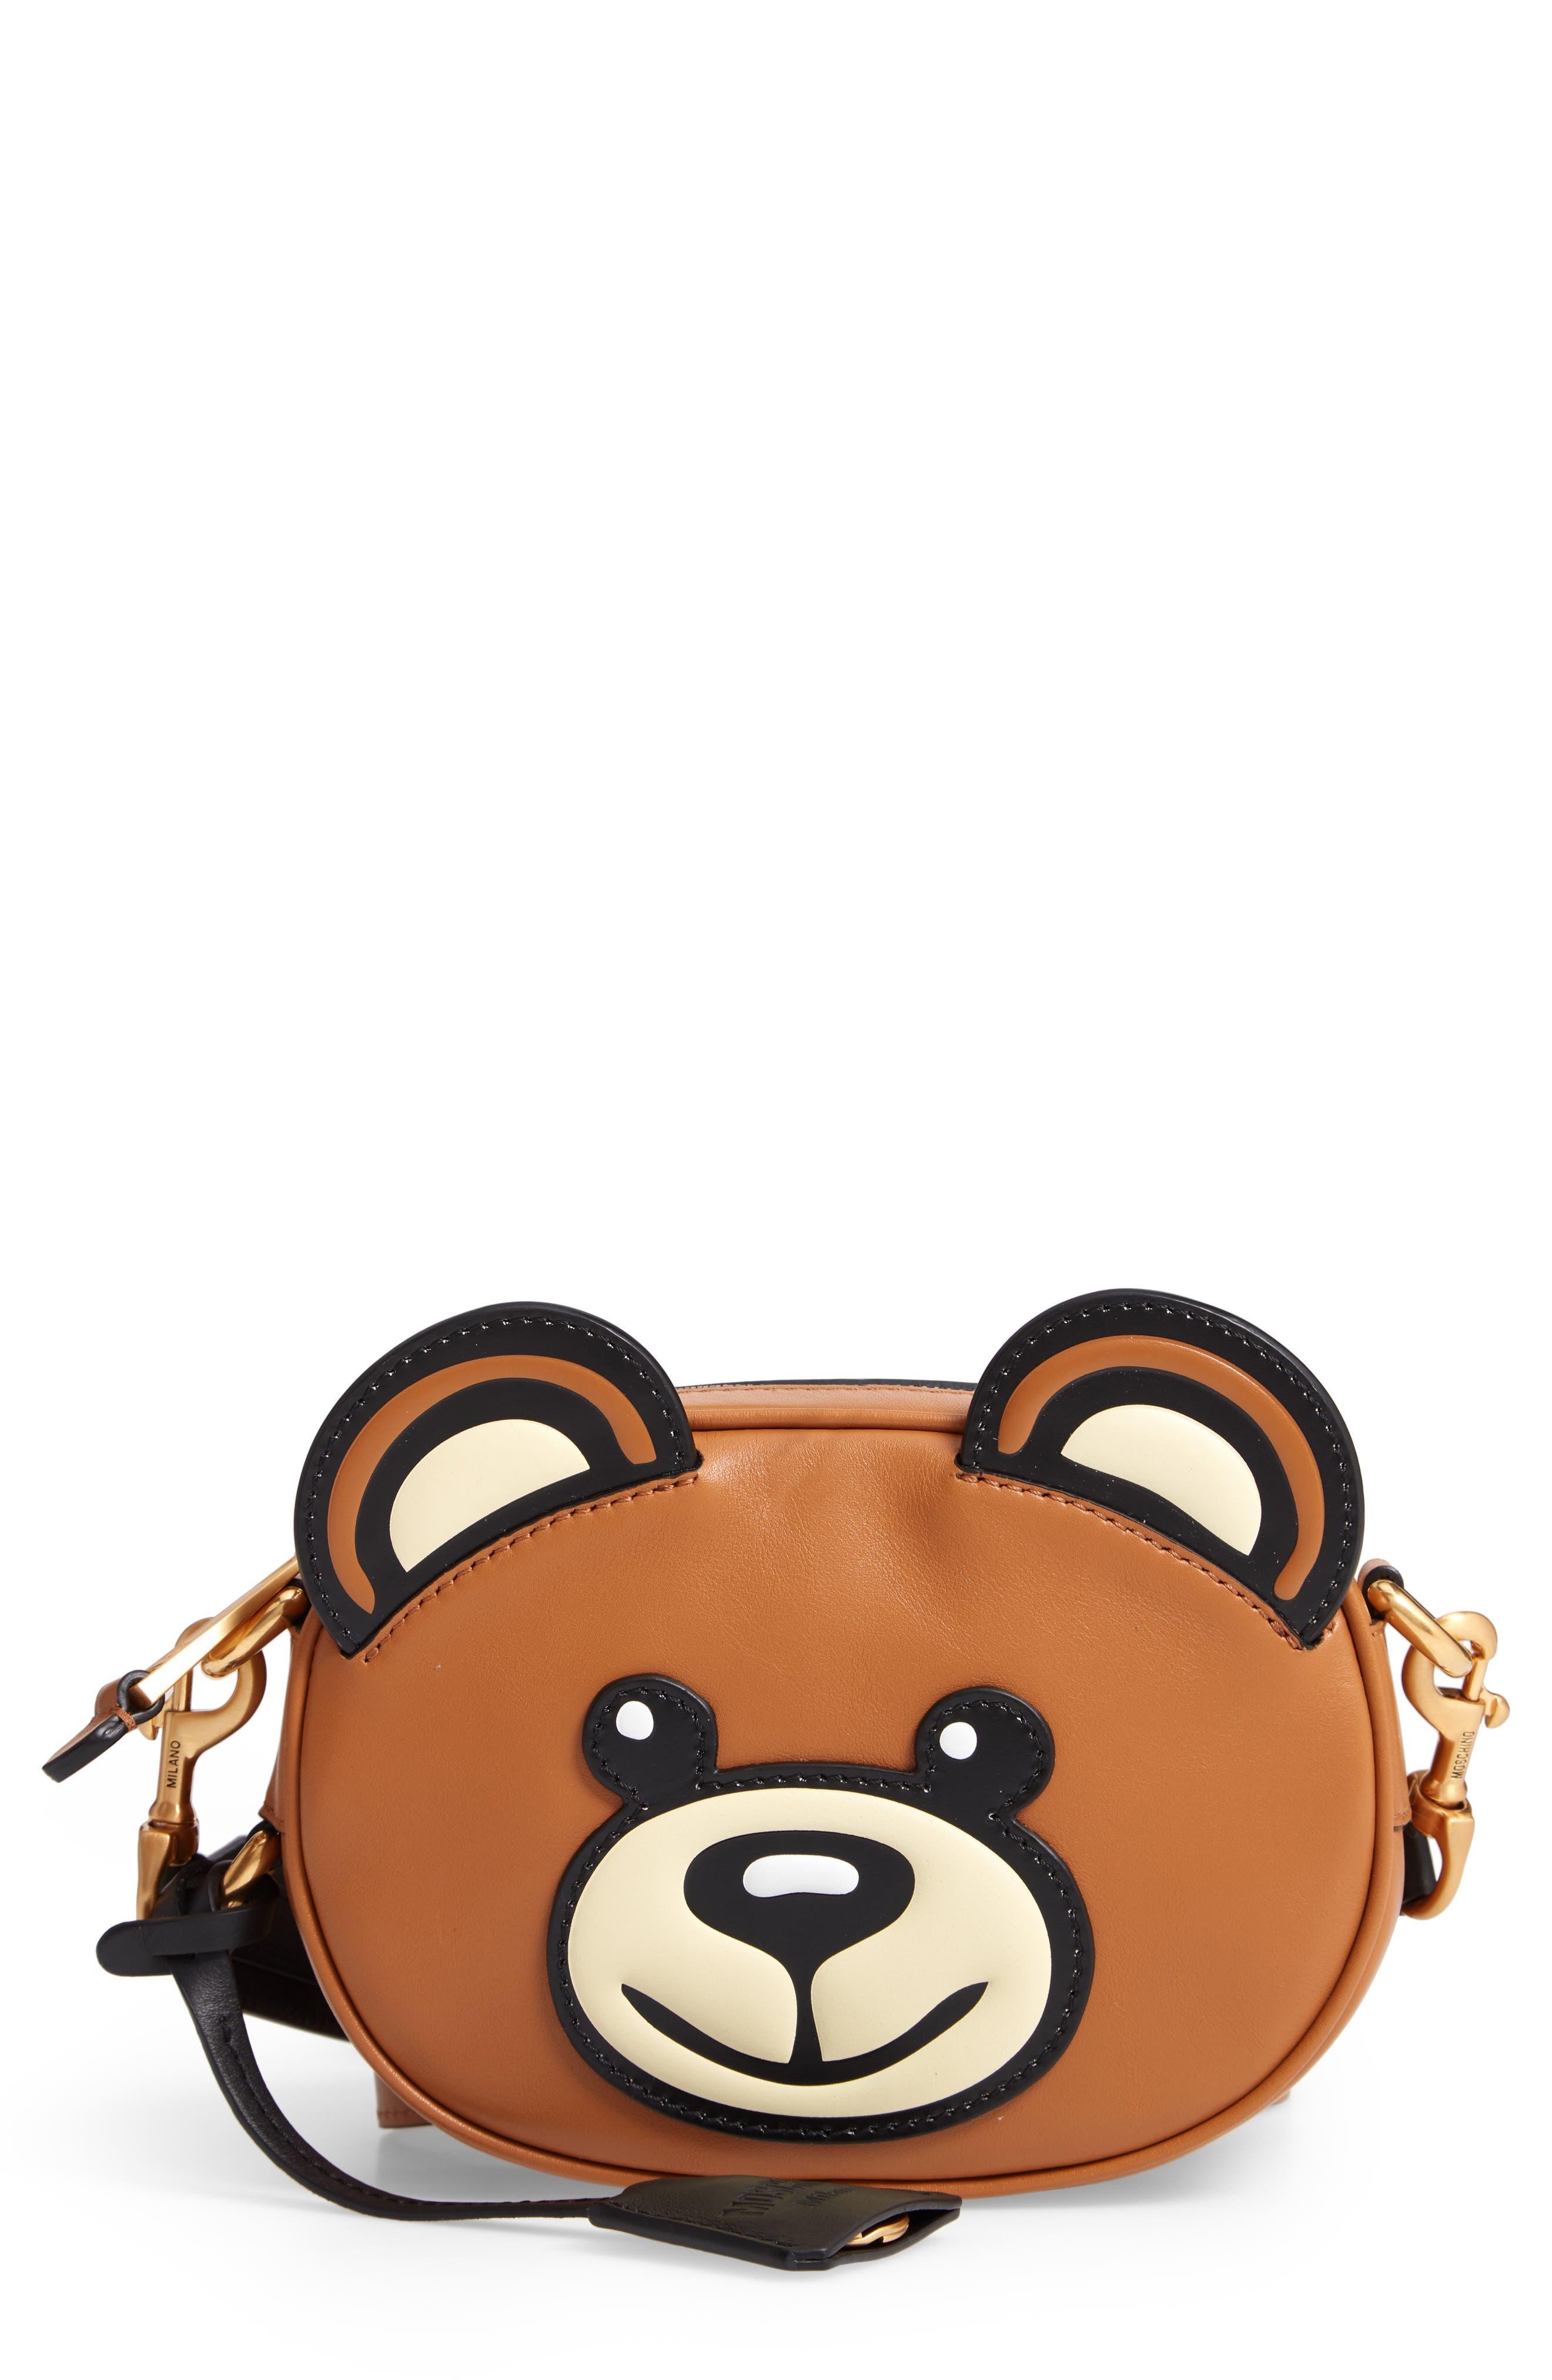 Crystal Teddy Leather Crossbody Bag,                             Main thumbnail 1, color,                             BROWN